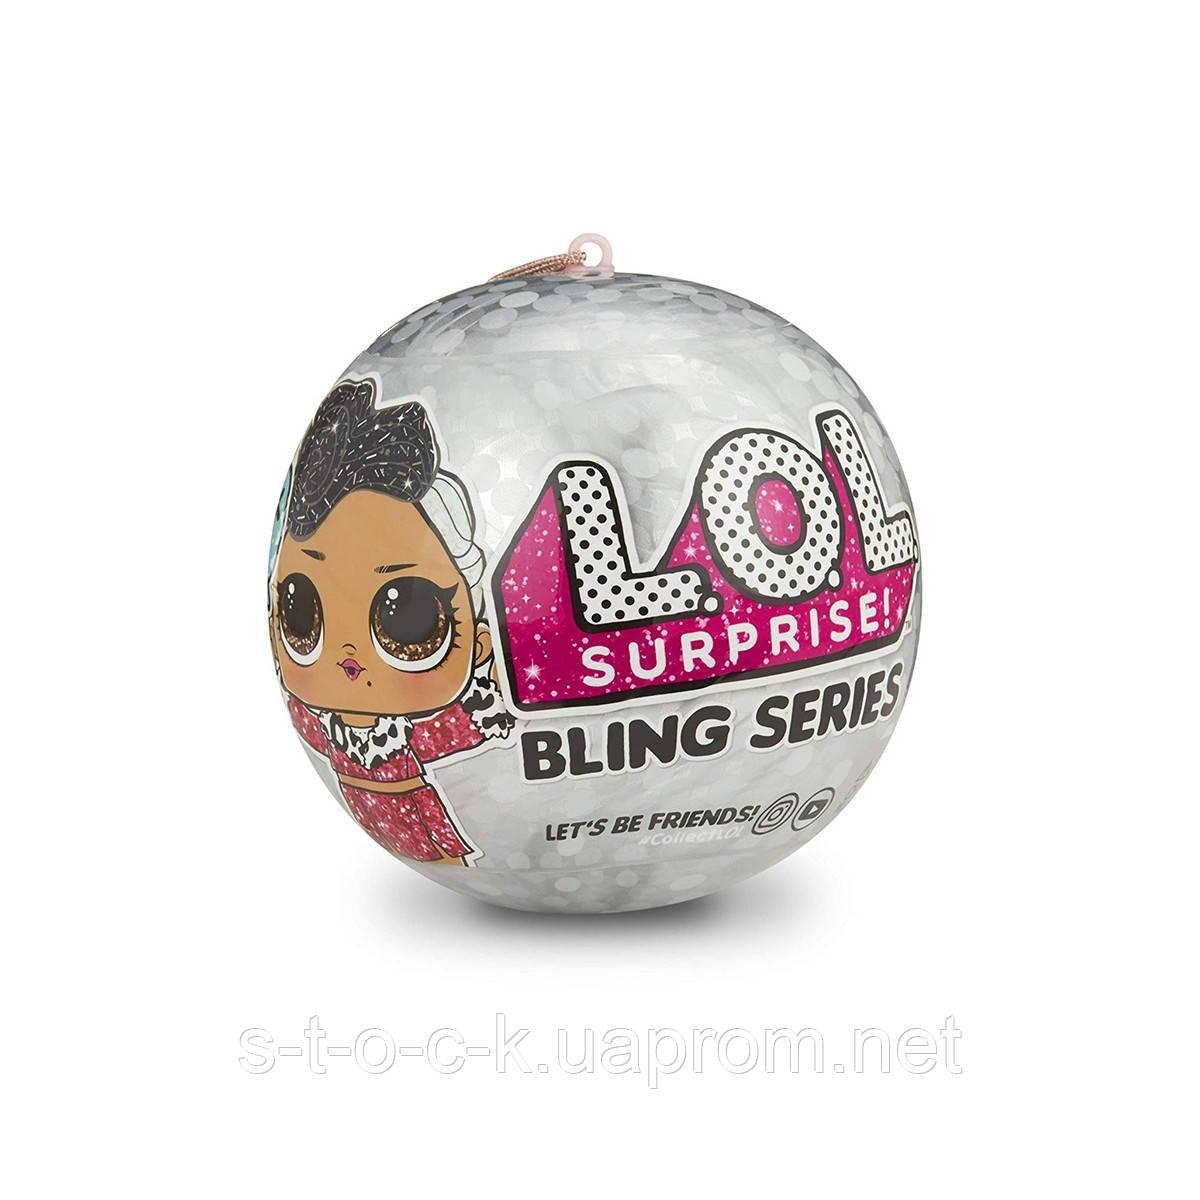 Кукла ЛОЛ Блинг Новогодний шар, LOL Surprise Bling Series